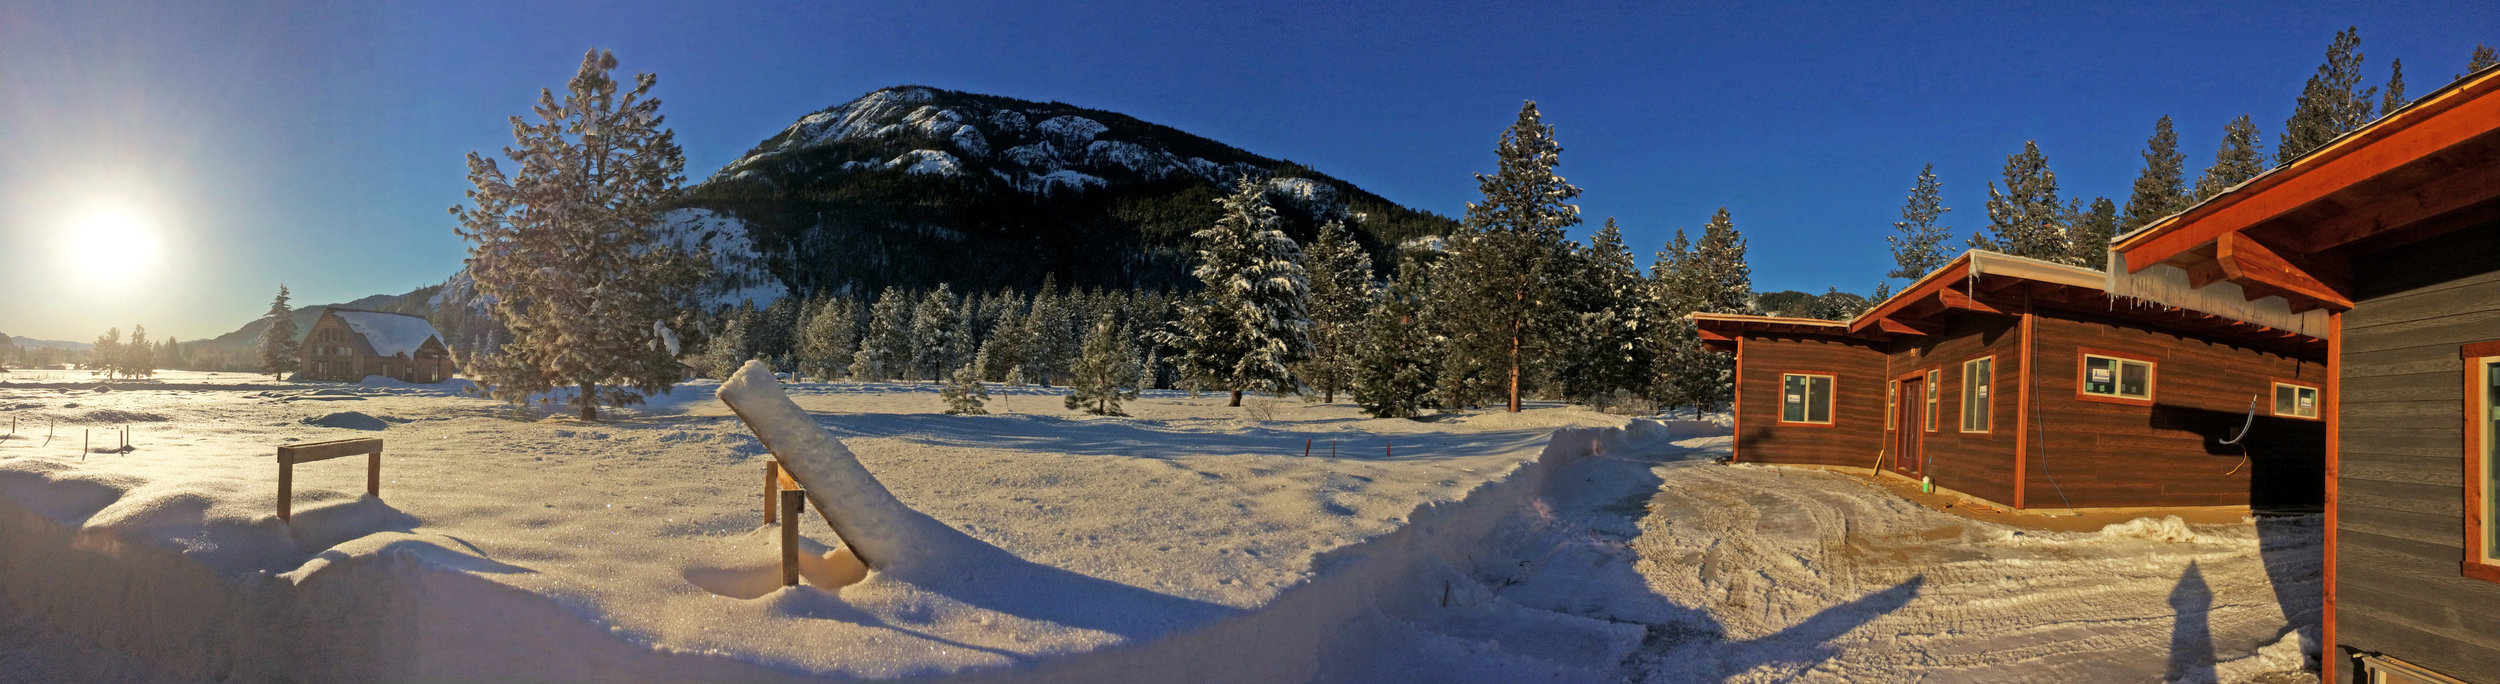 MHT.Mckinney.Panorama.brightened.01.29.2019.SarahStephens.jpg